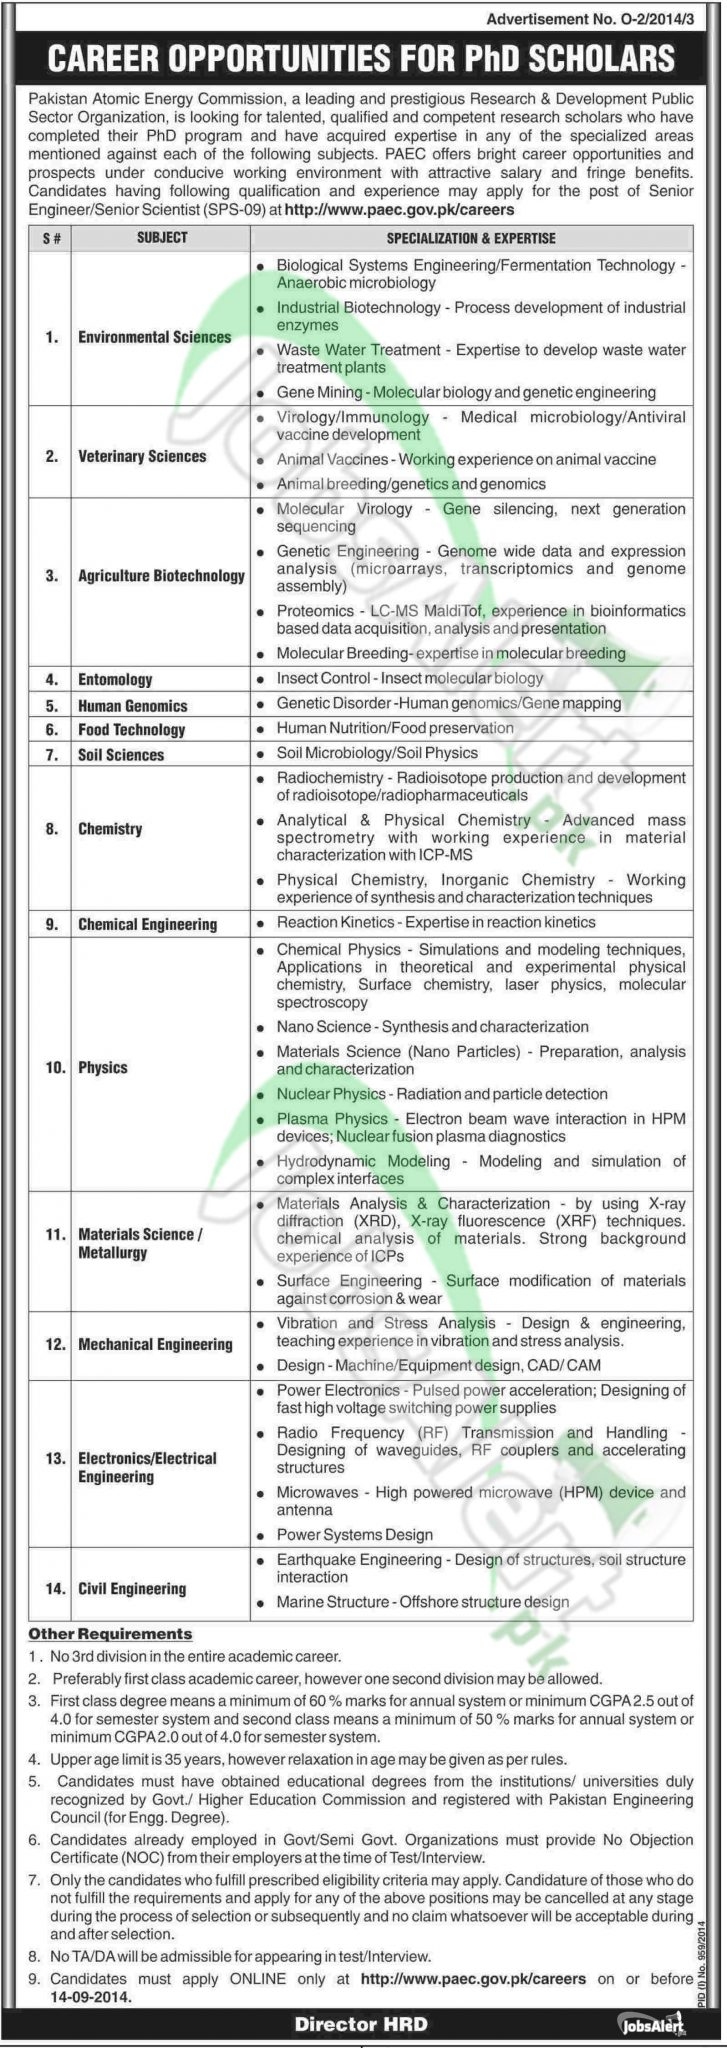 Pakistan Atomic Energy Commission (PAEC) Islamabad